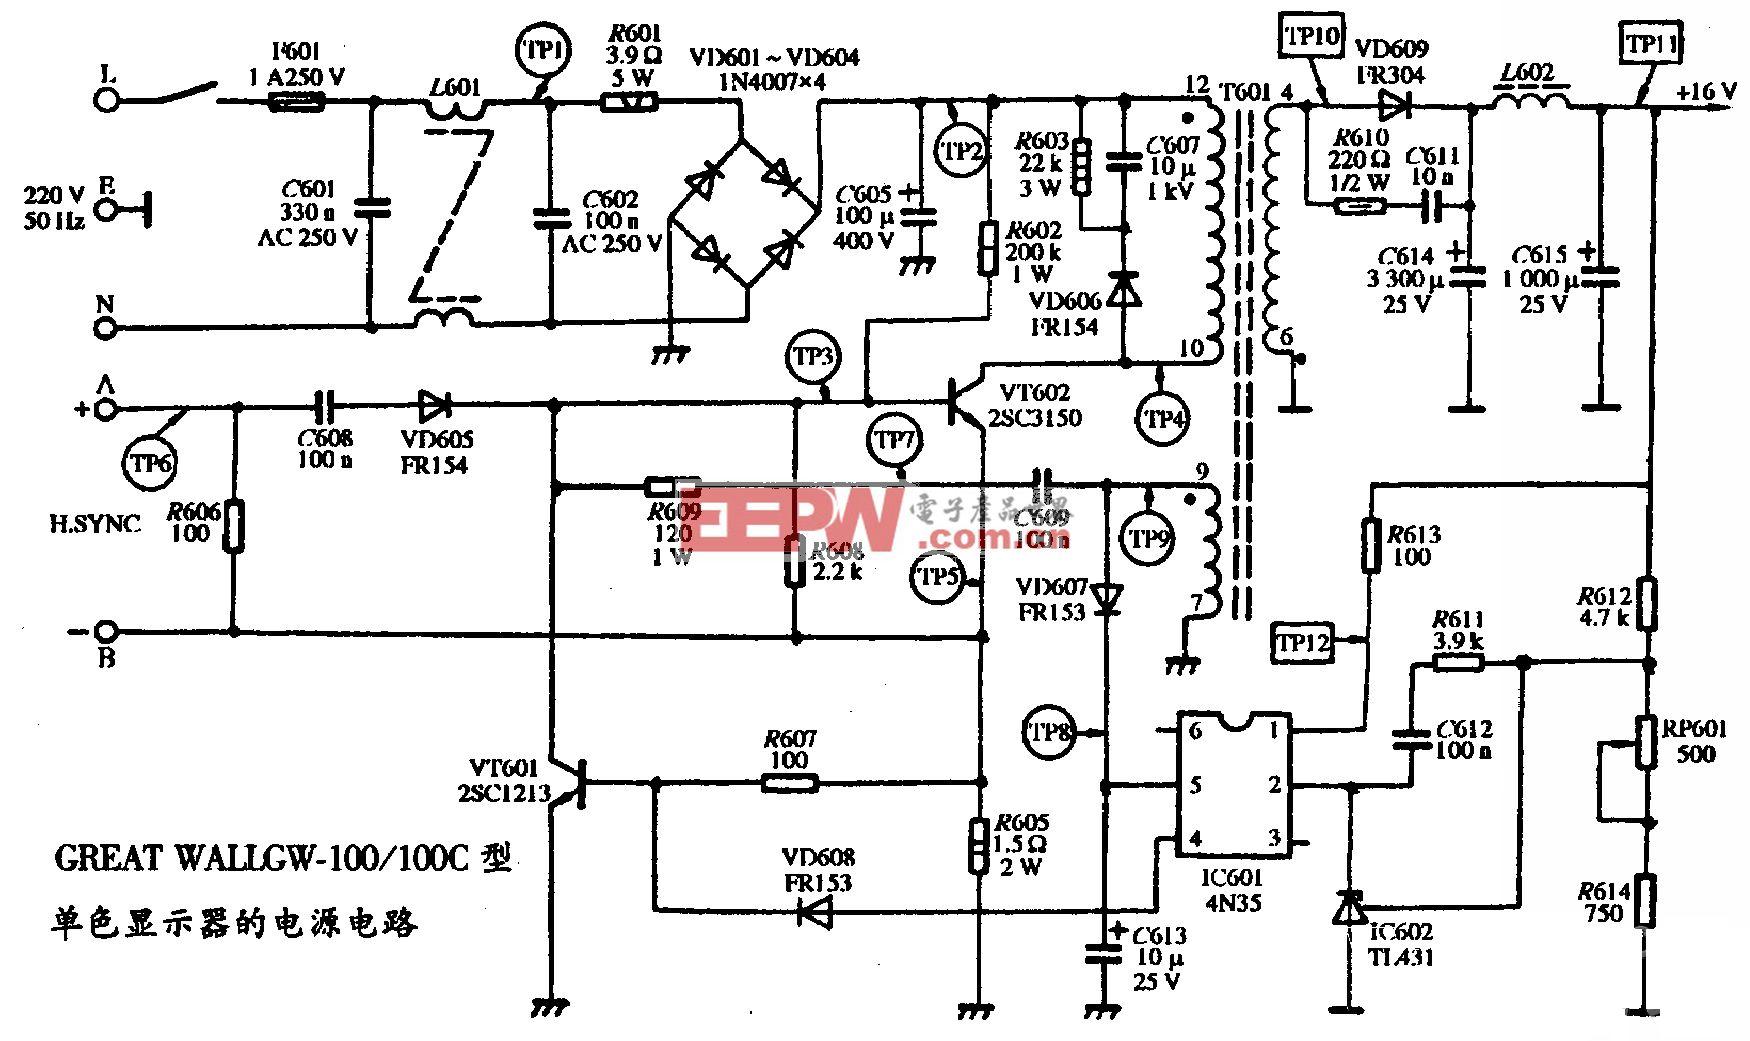 GREAT WALL GW-100/100C型单色显示器的电源电路图